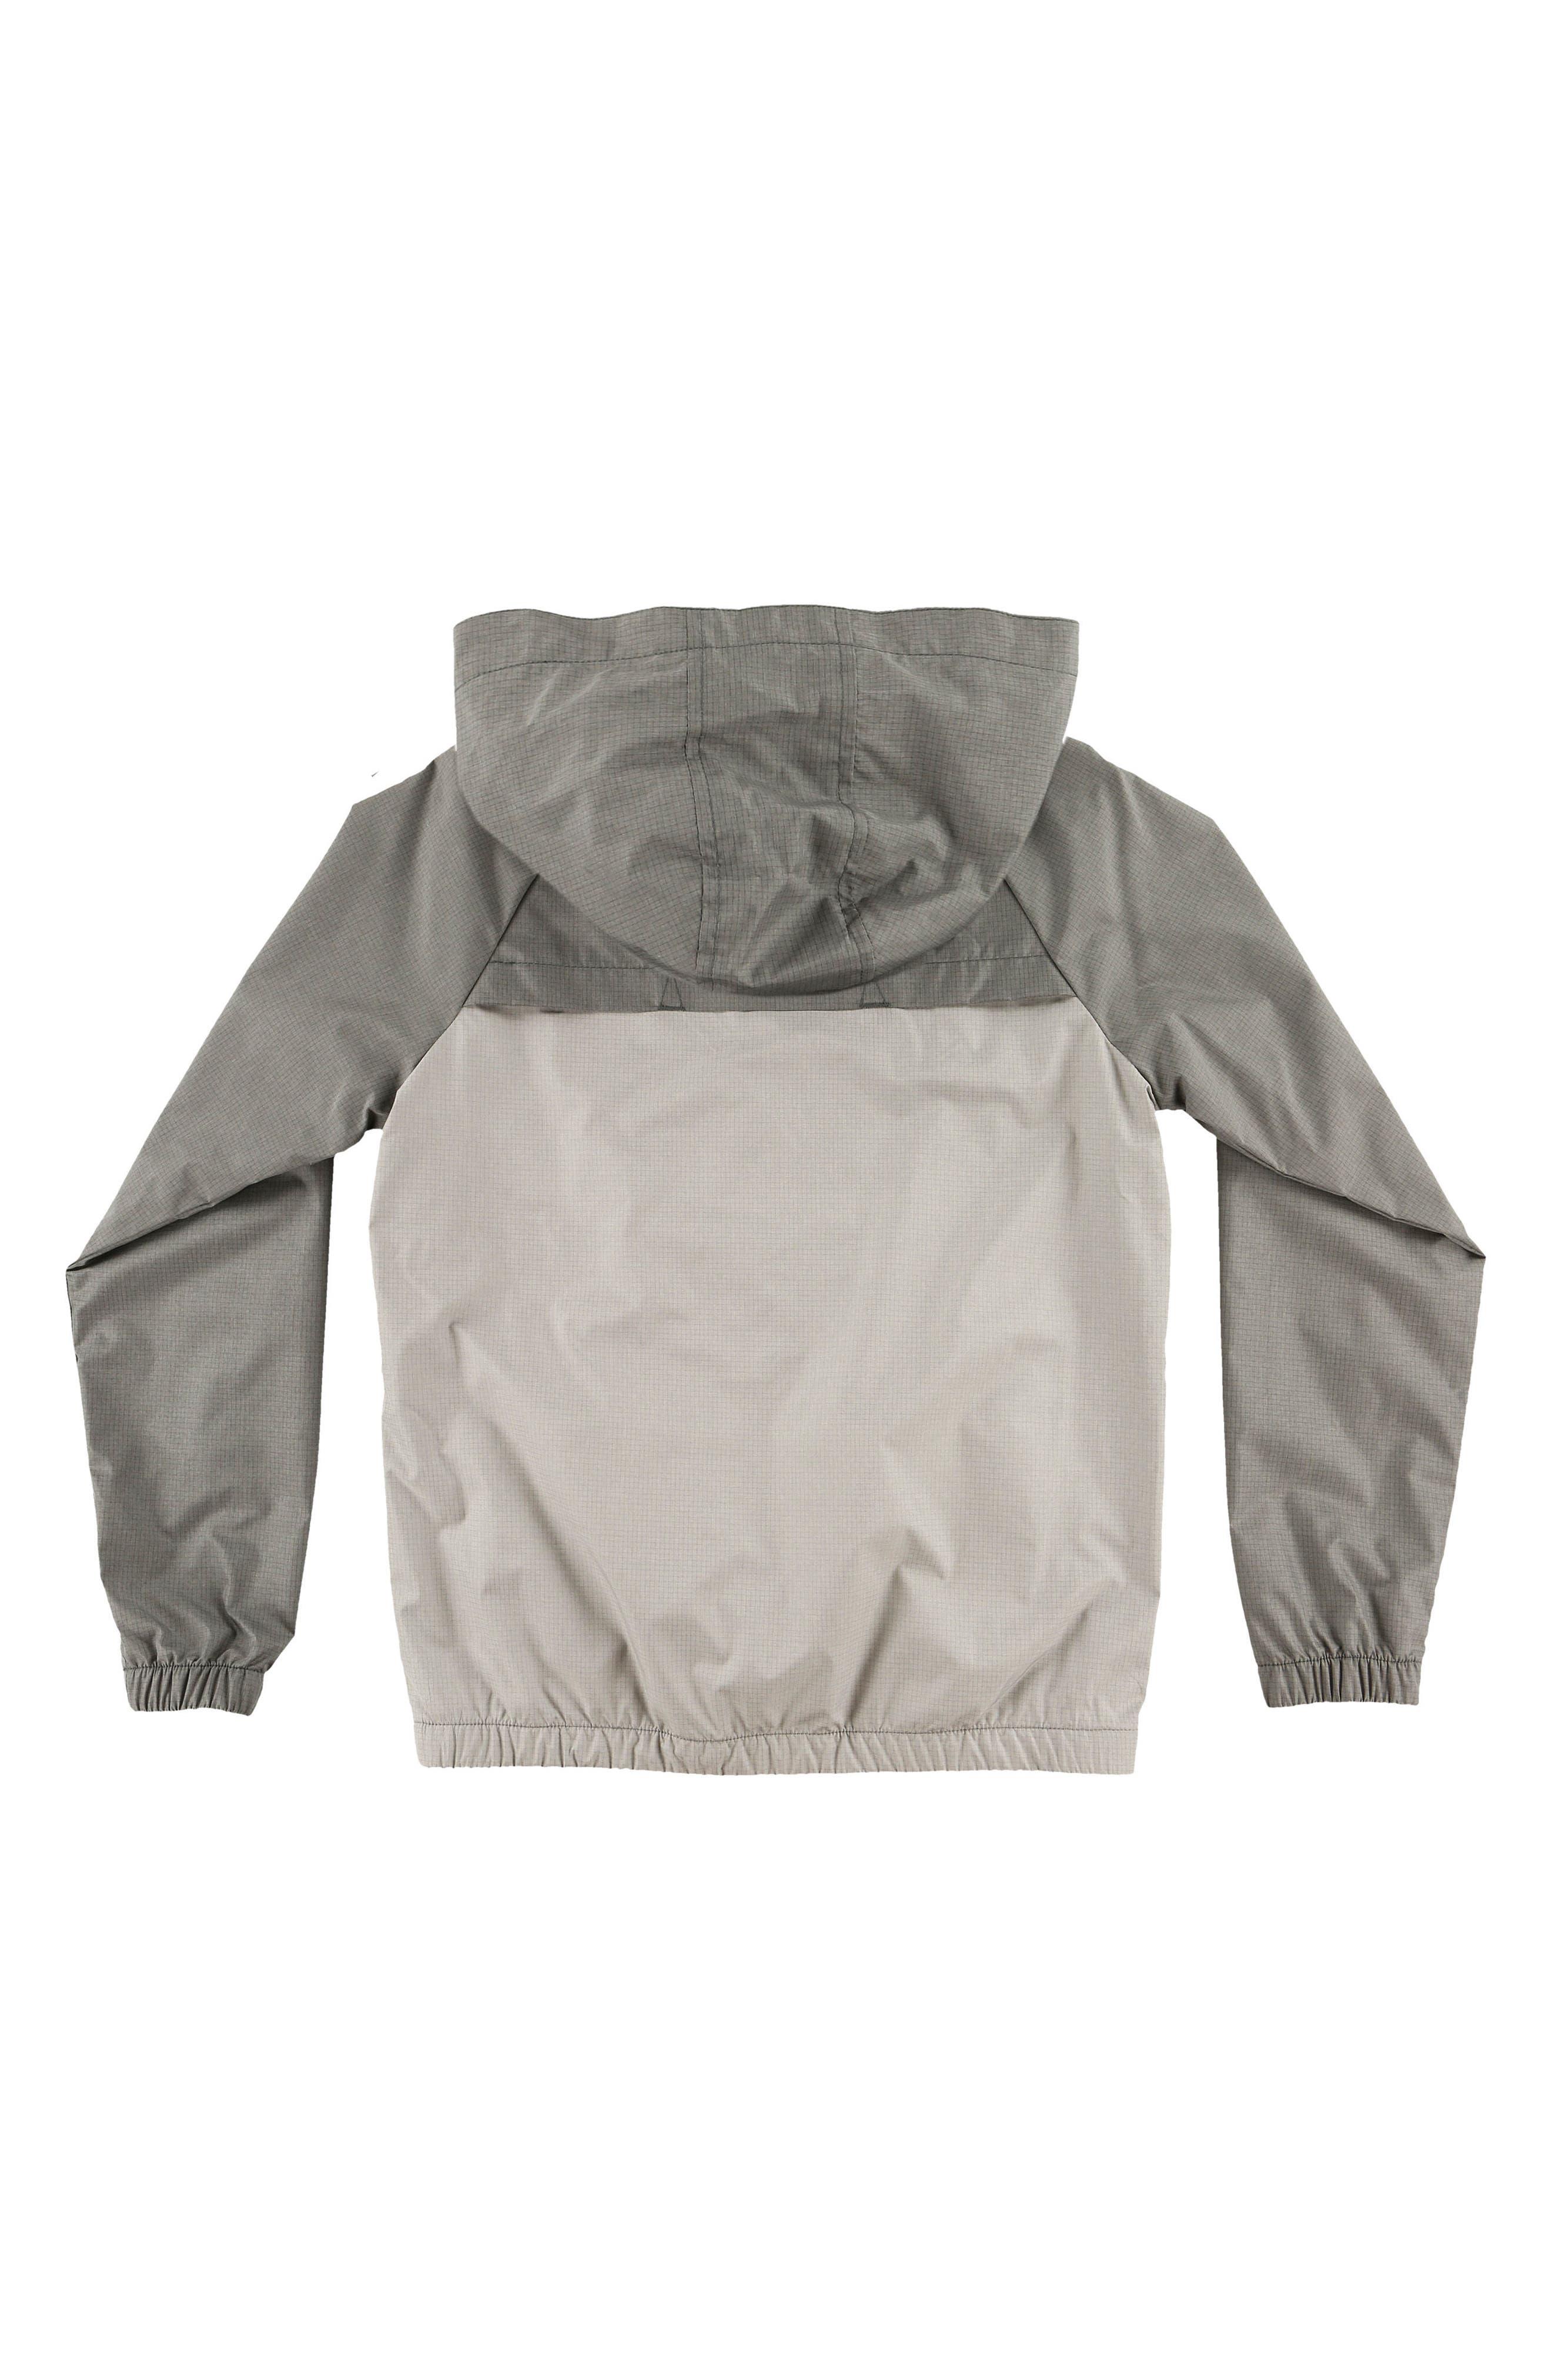 Traveler Packable Windbreaker Jacket,                         Main,                         color, 020